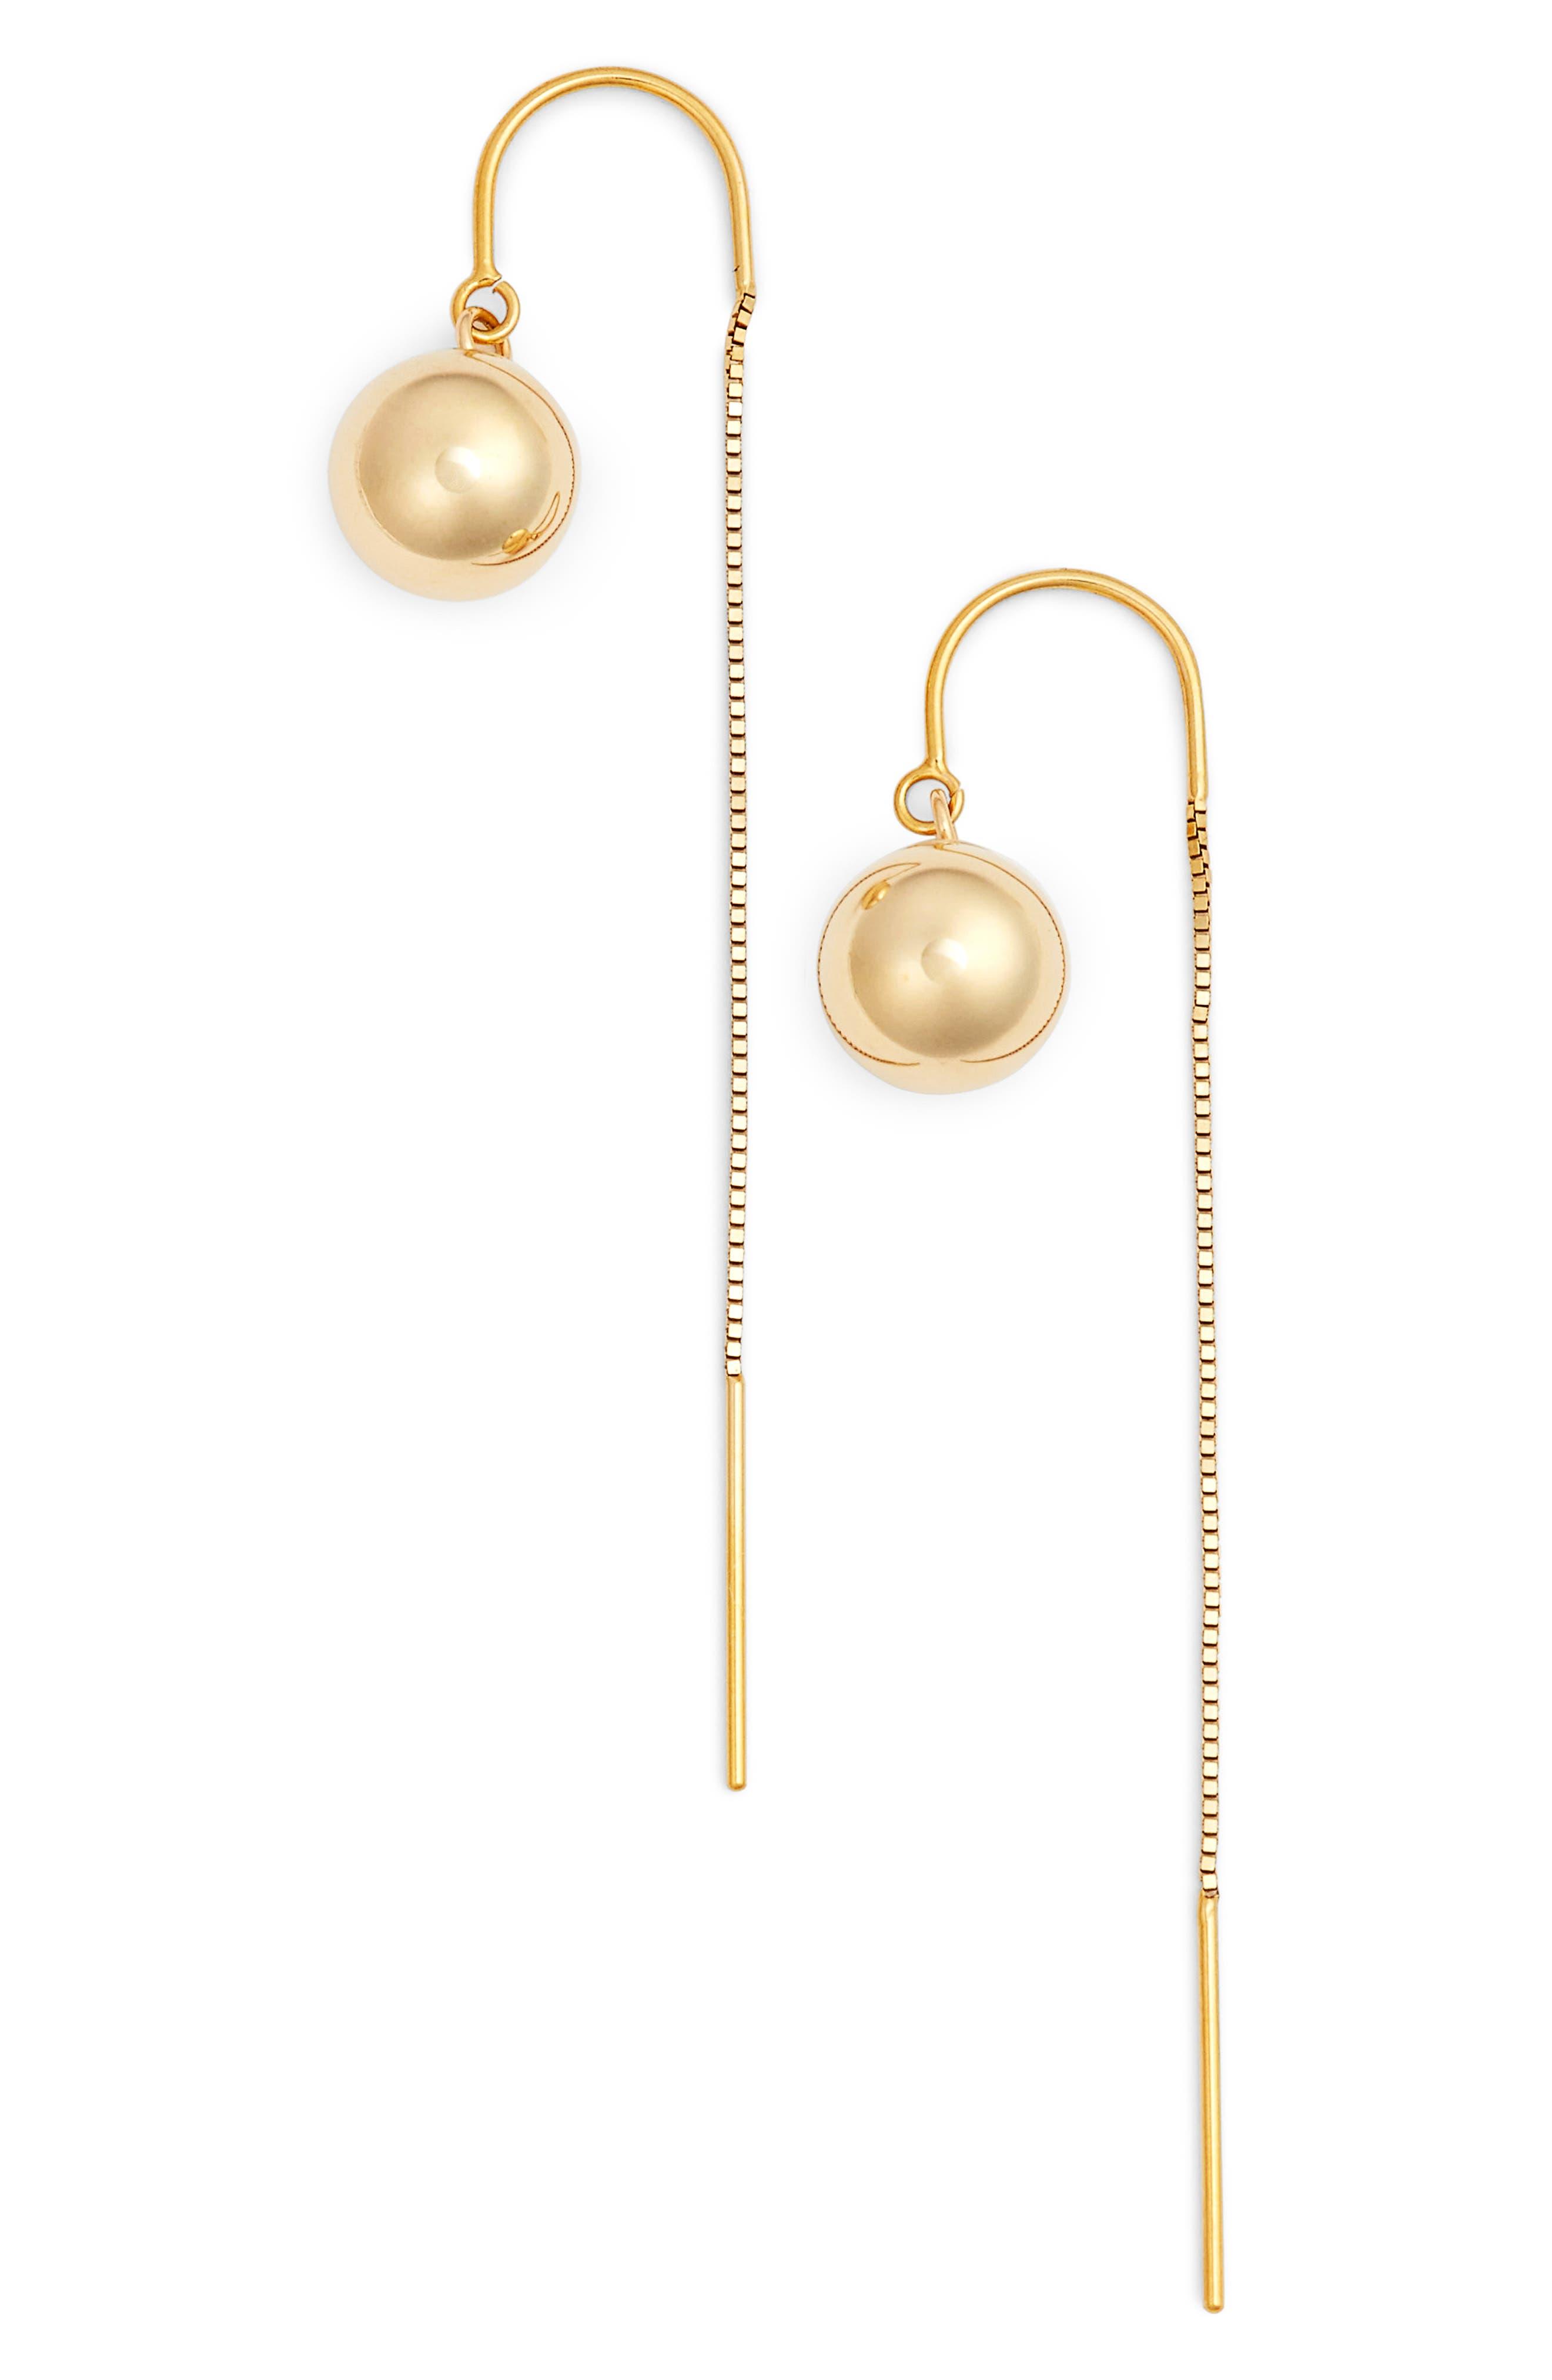 Gold Ball Threader Earrings,                             Main thumbnail 1, color,                             710